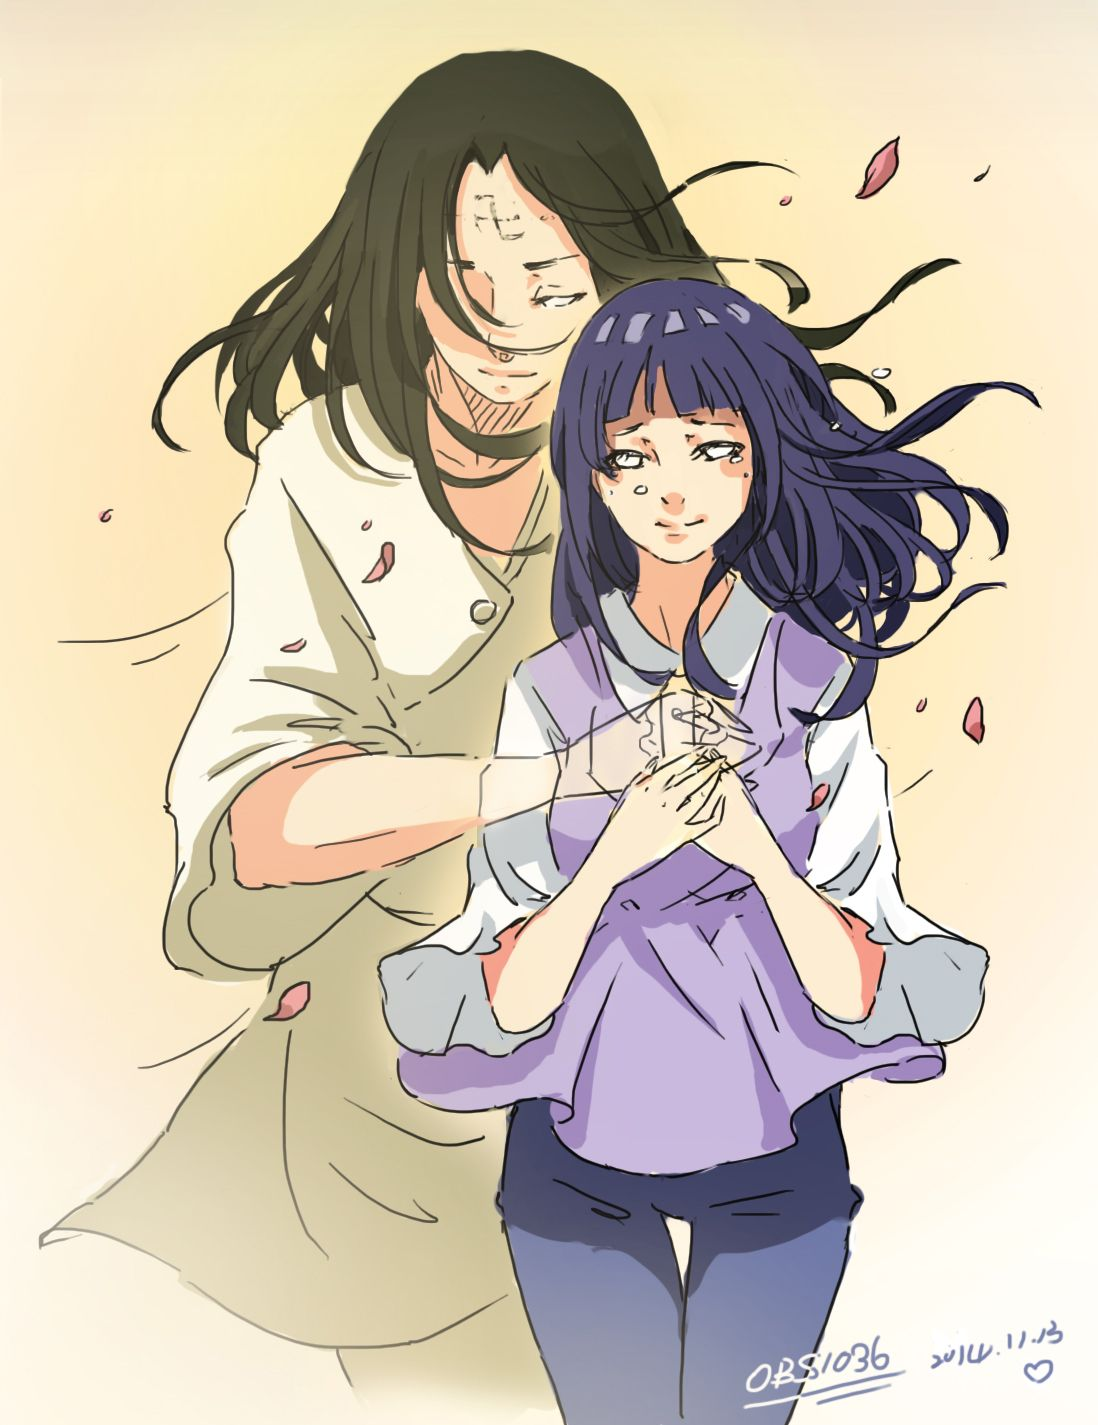 Hardcore yuri anime titles